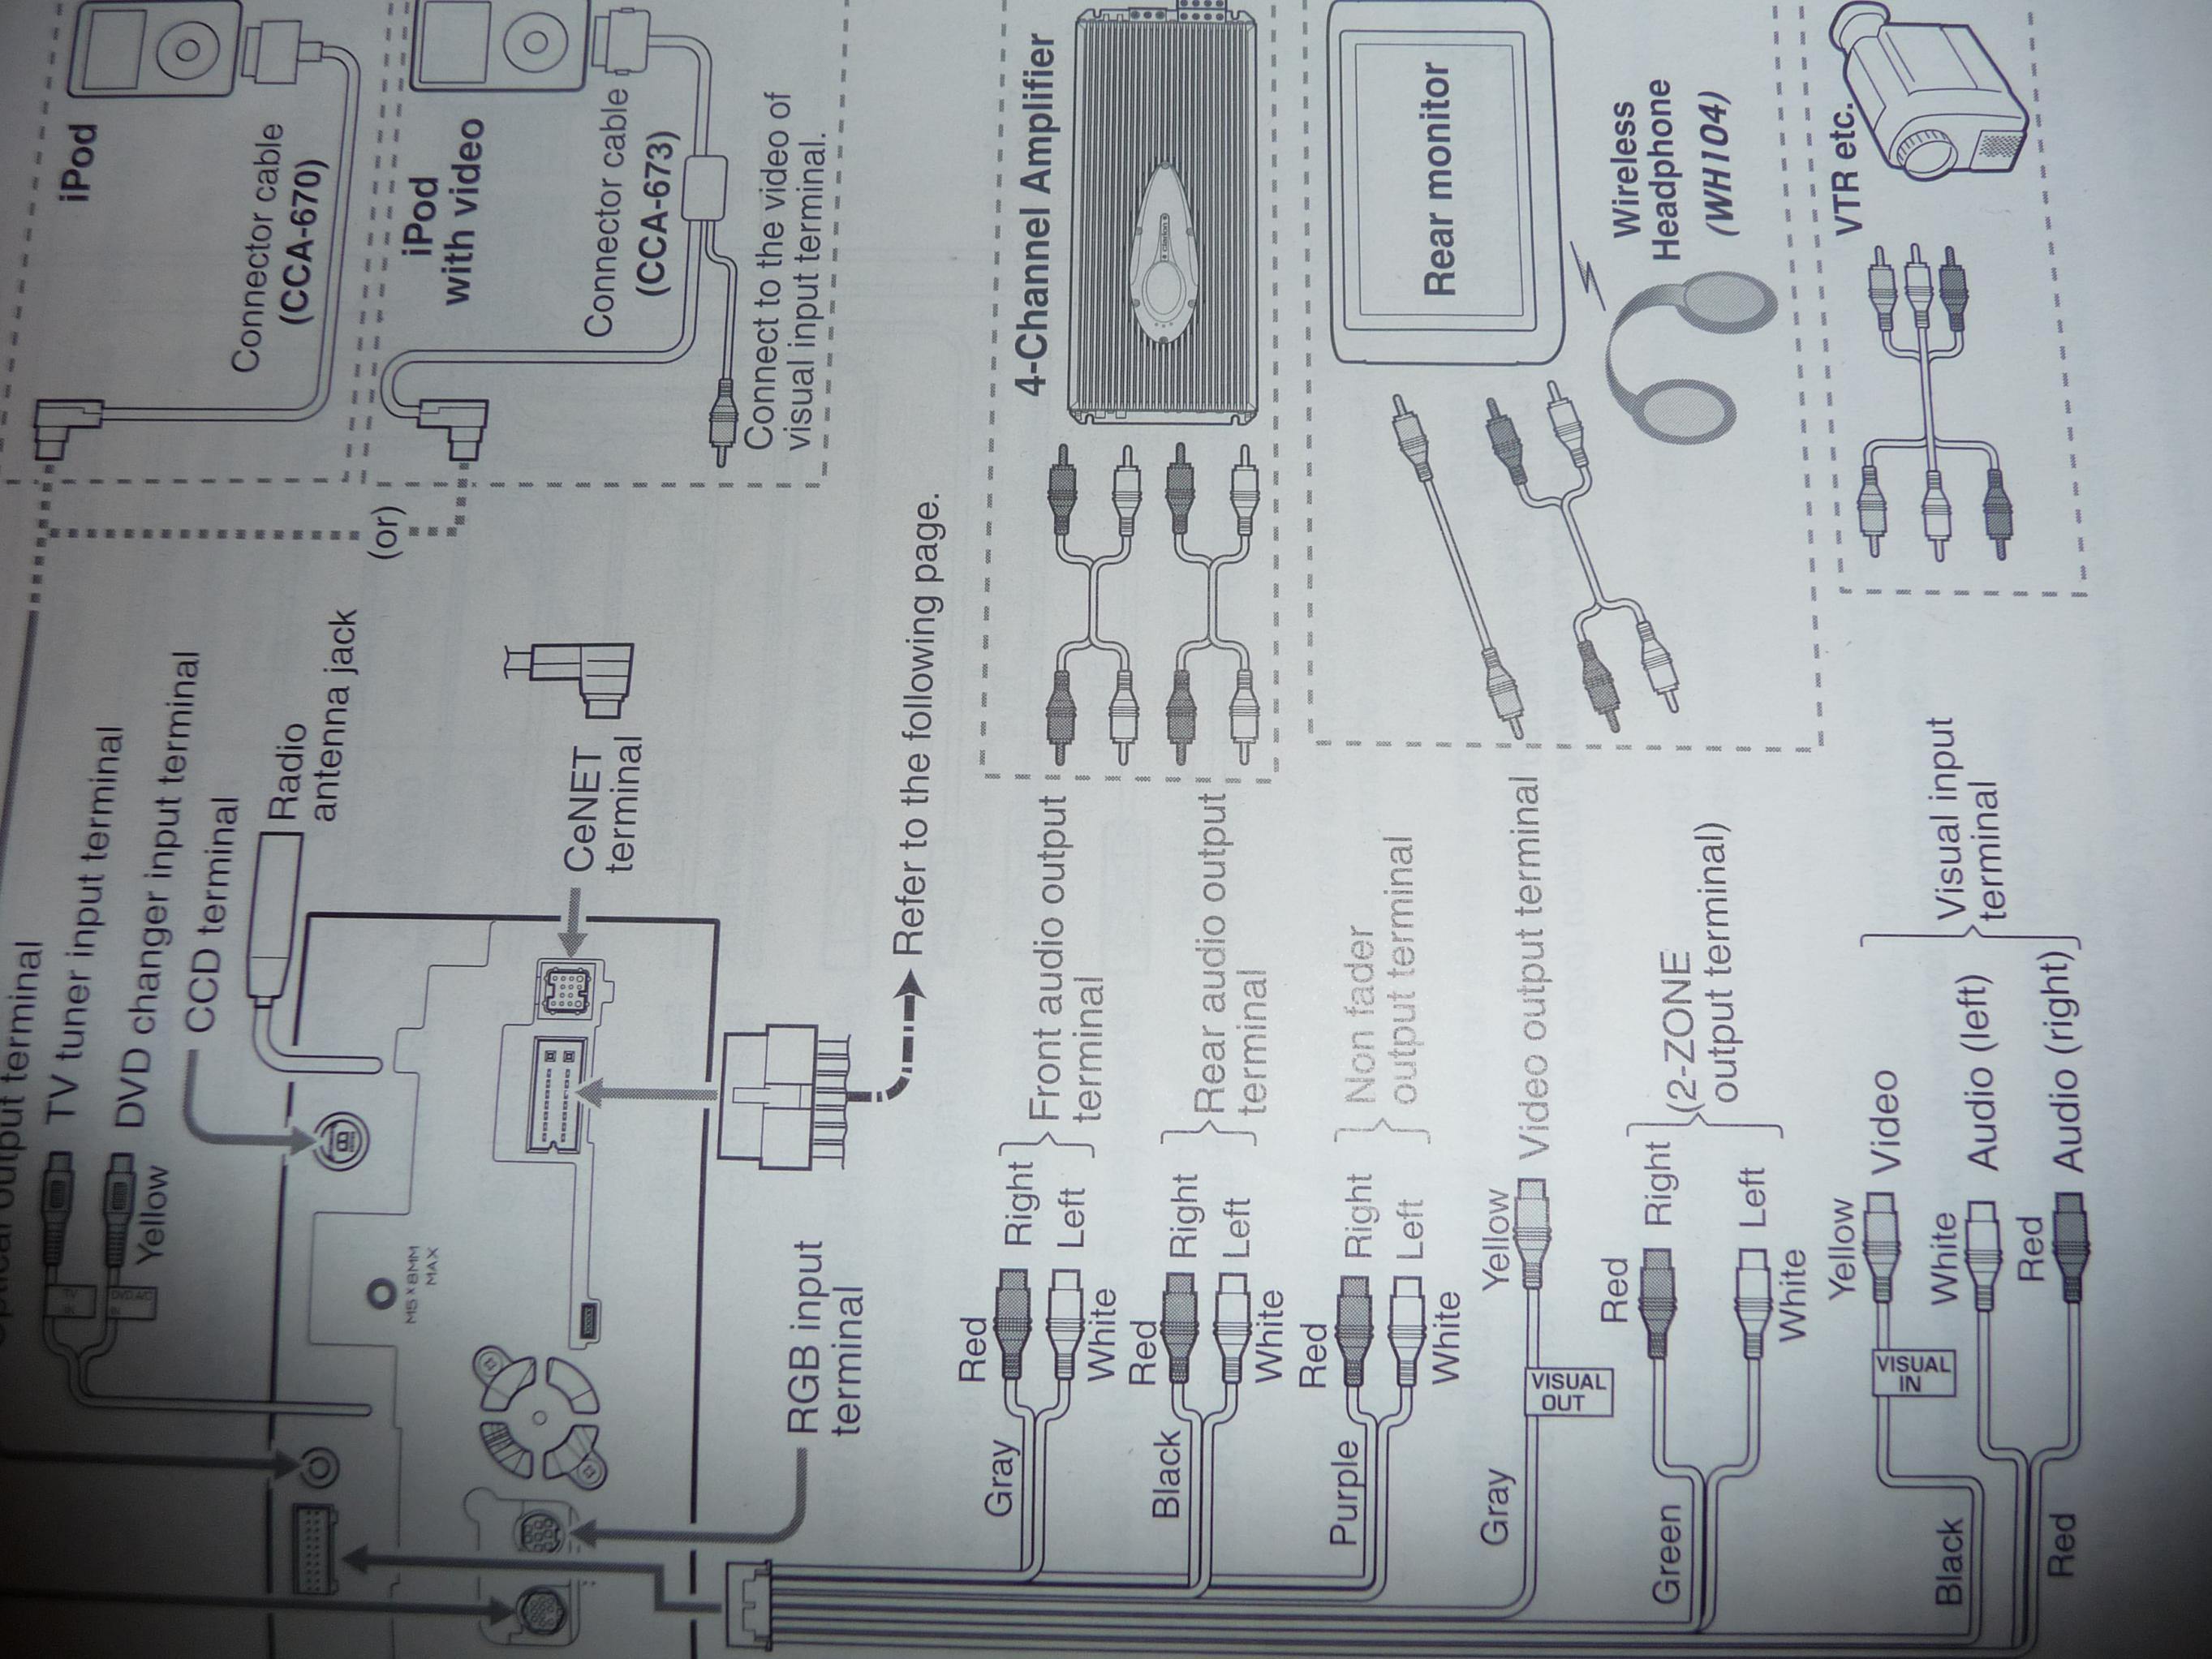 clarion max675vd wiring rca diagram wiring diagrams cks rh 7 awecxe diamond sisters de